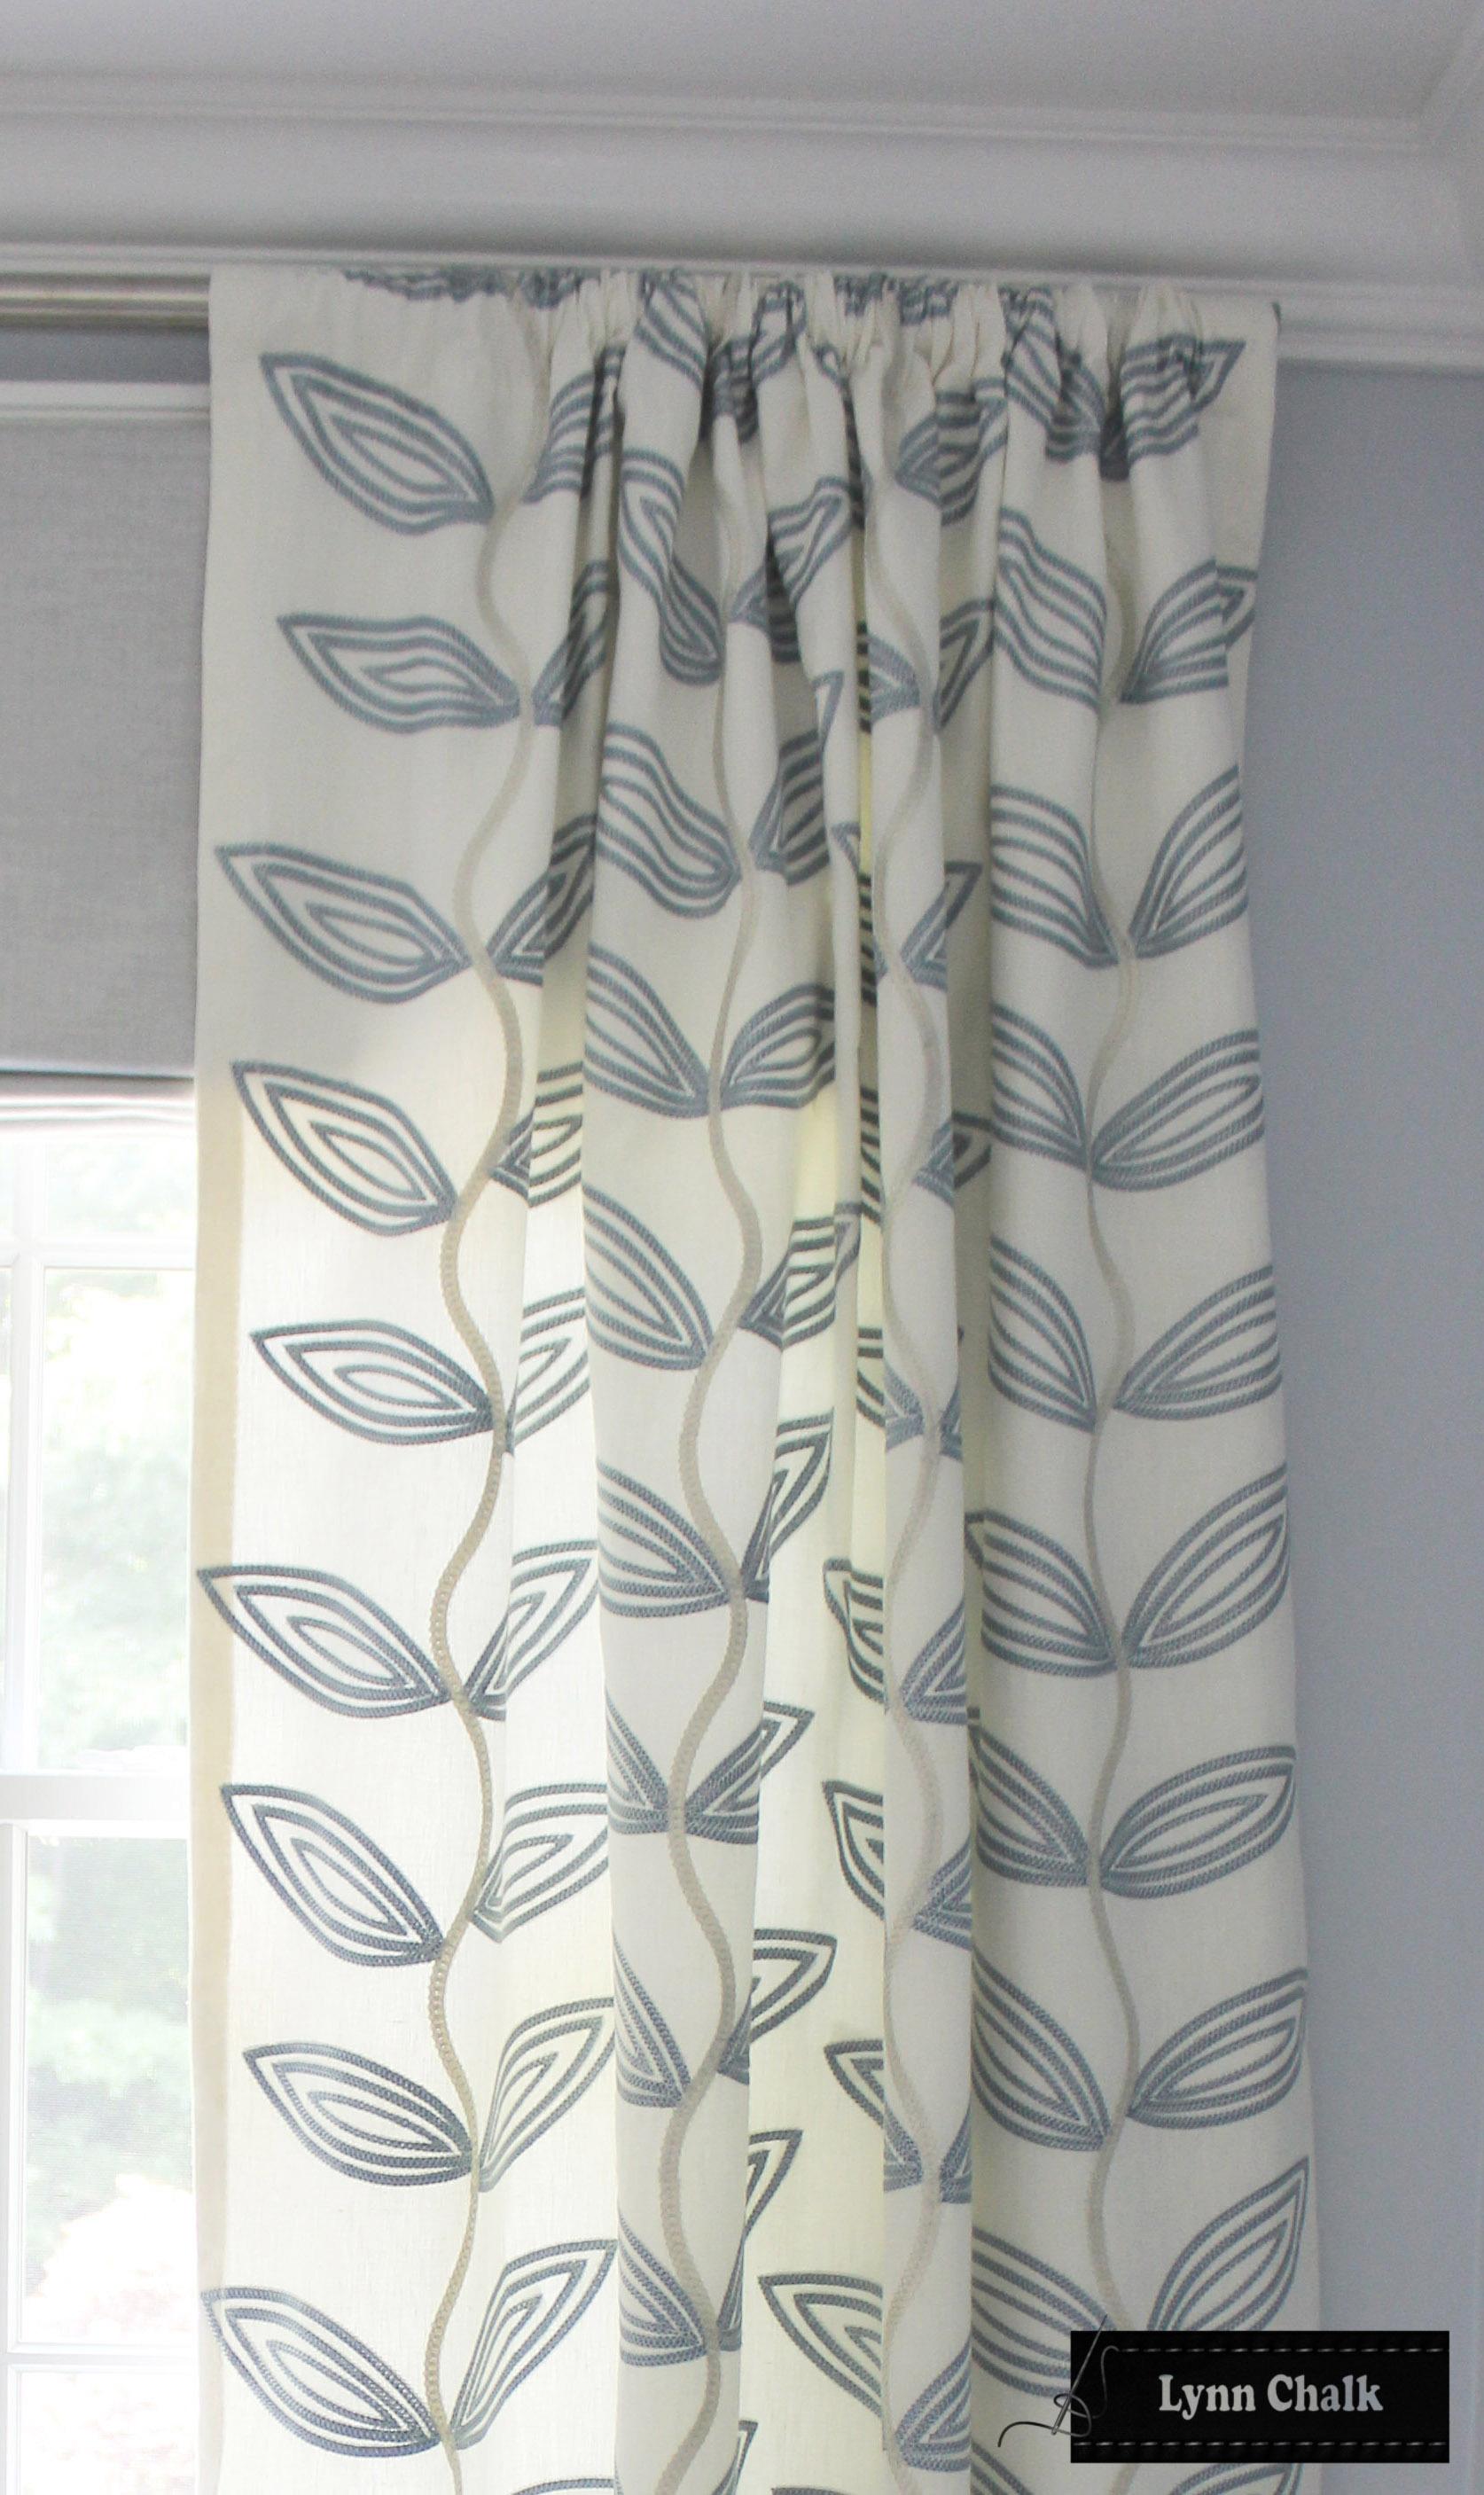 manuel-canovas-fiesta-4711-01-ceil-drapes-with-roman-shades-holly-hunt-great-outdoors-clear-the-air-slate-231-04-lynn-chalki.jpg